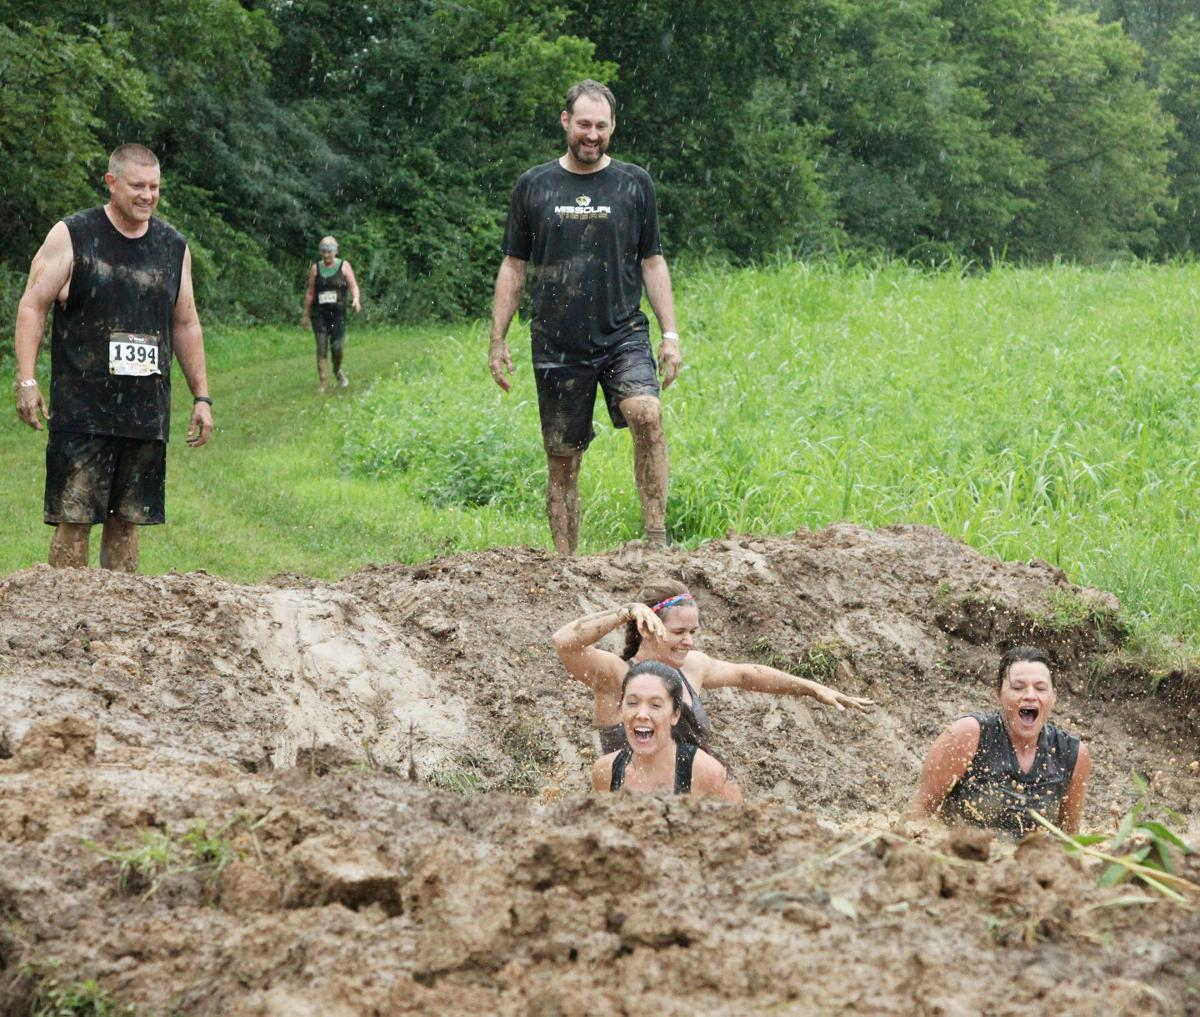 33 Mud Run Gallery 3 2015.jpg